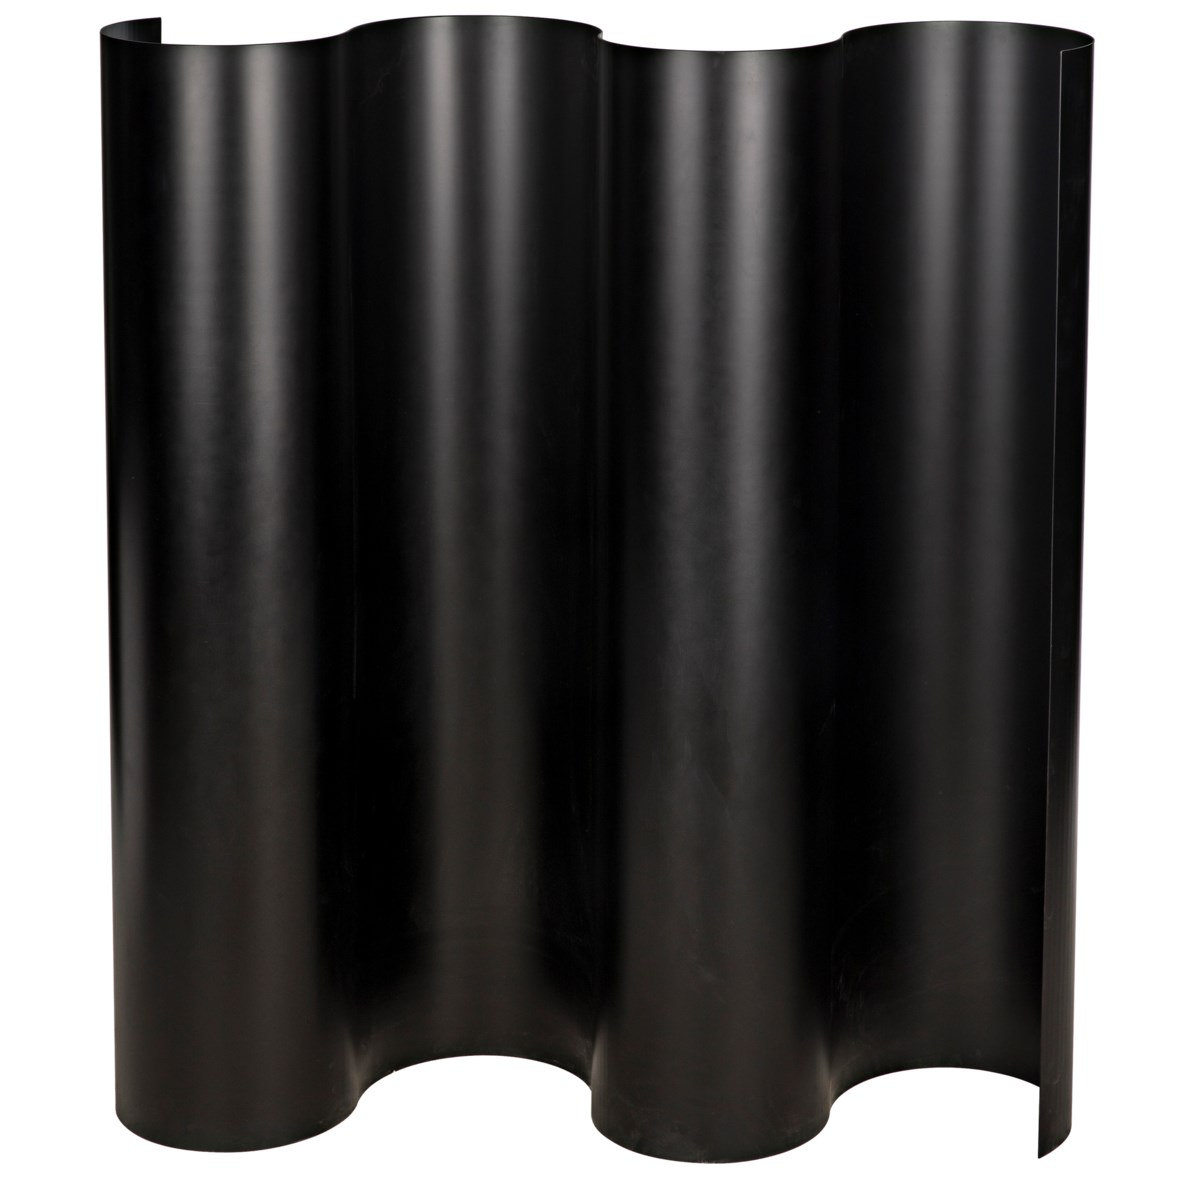 Levo Screen, Black Steel